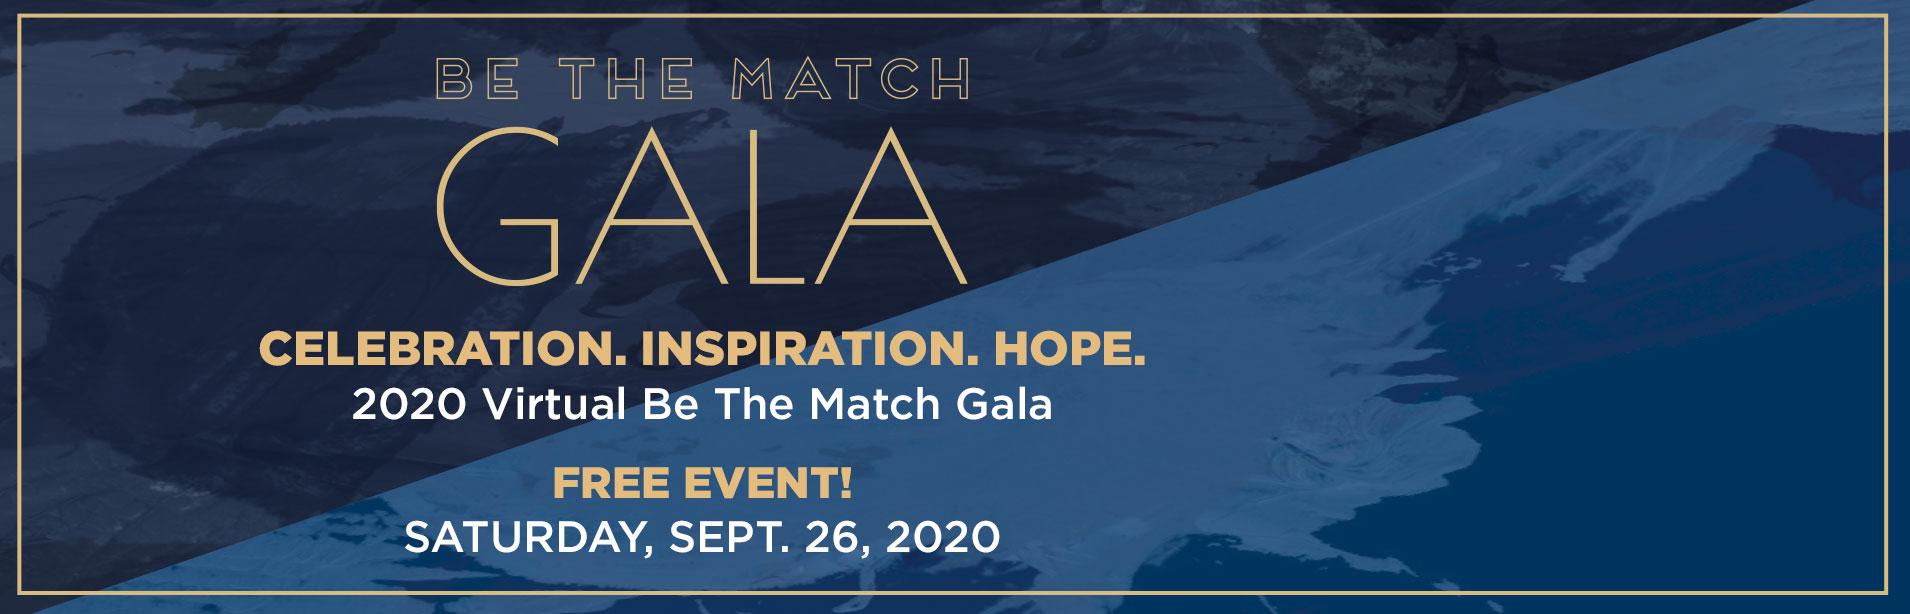 BTM Gala 2020